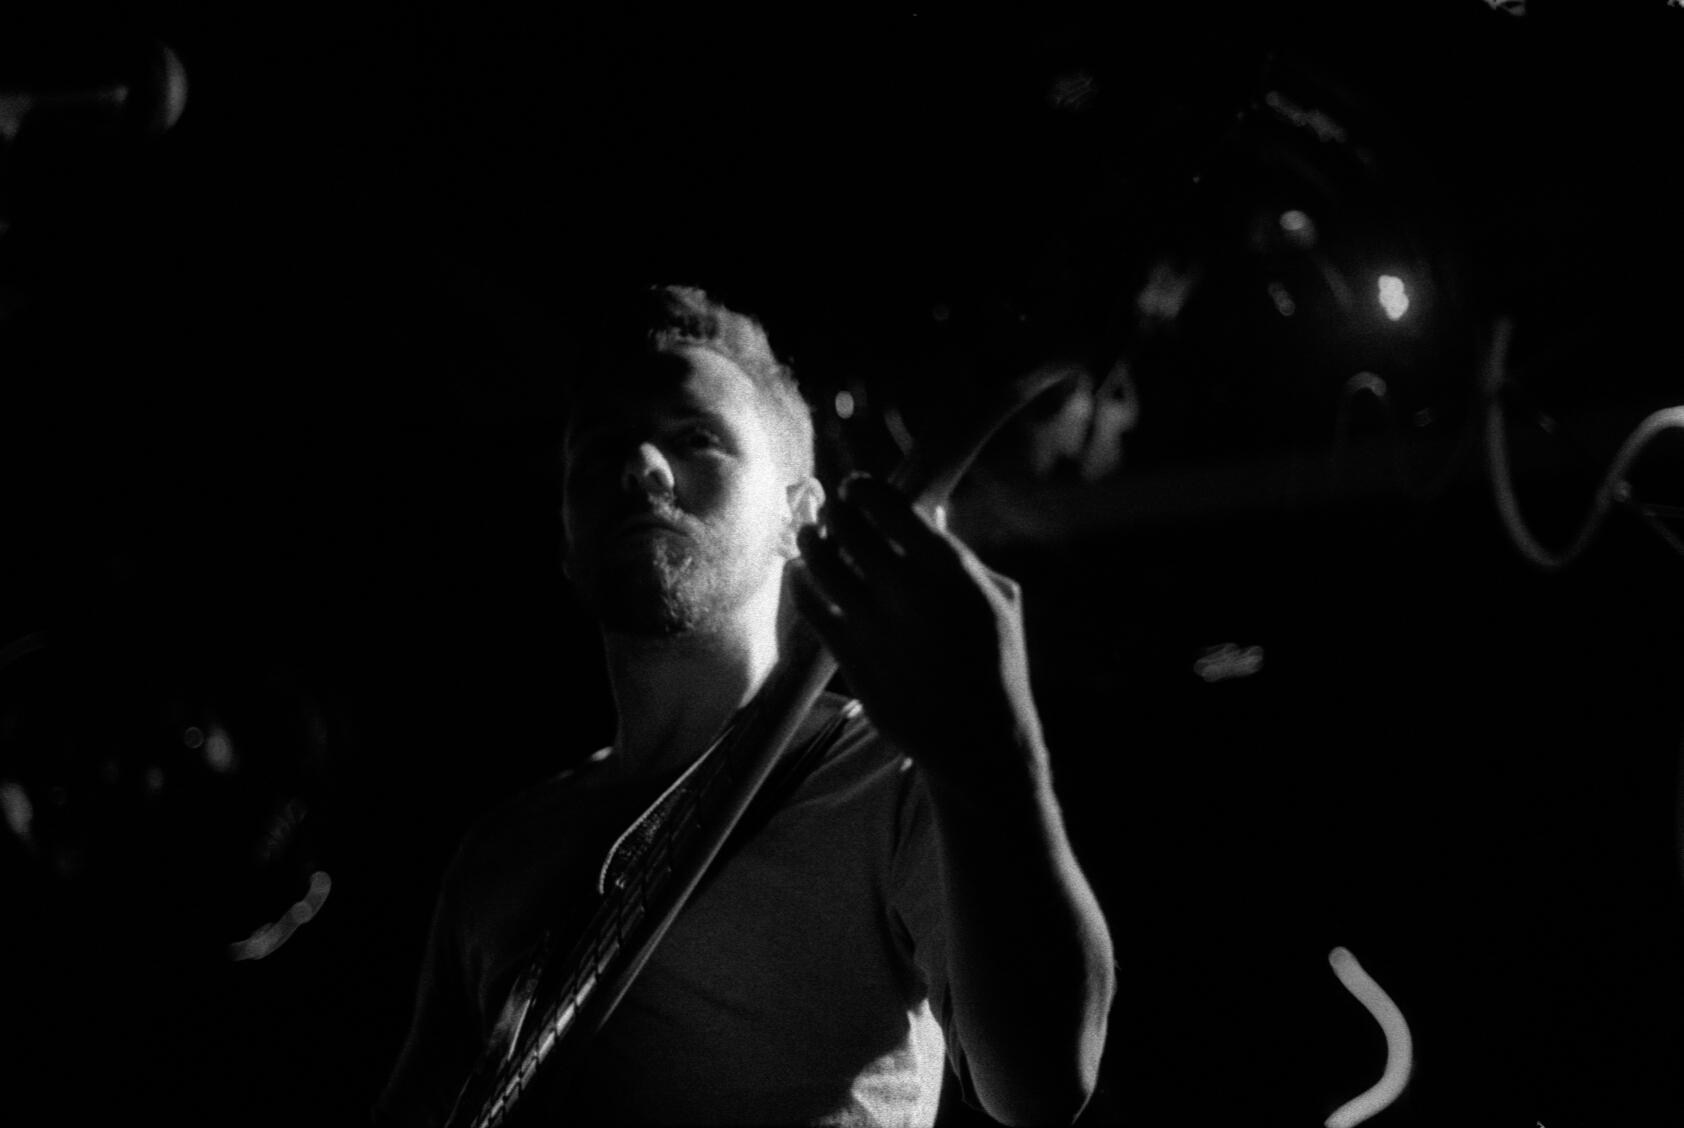 <div class='info-header'>Photographer</div> <a href='https://www.instagram.com/americanlean/' target='_blank'>Lea Taillefer</a>